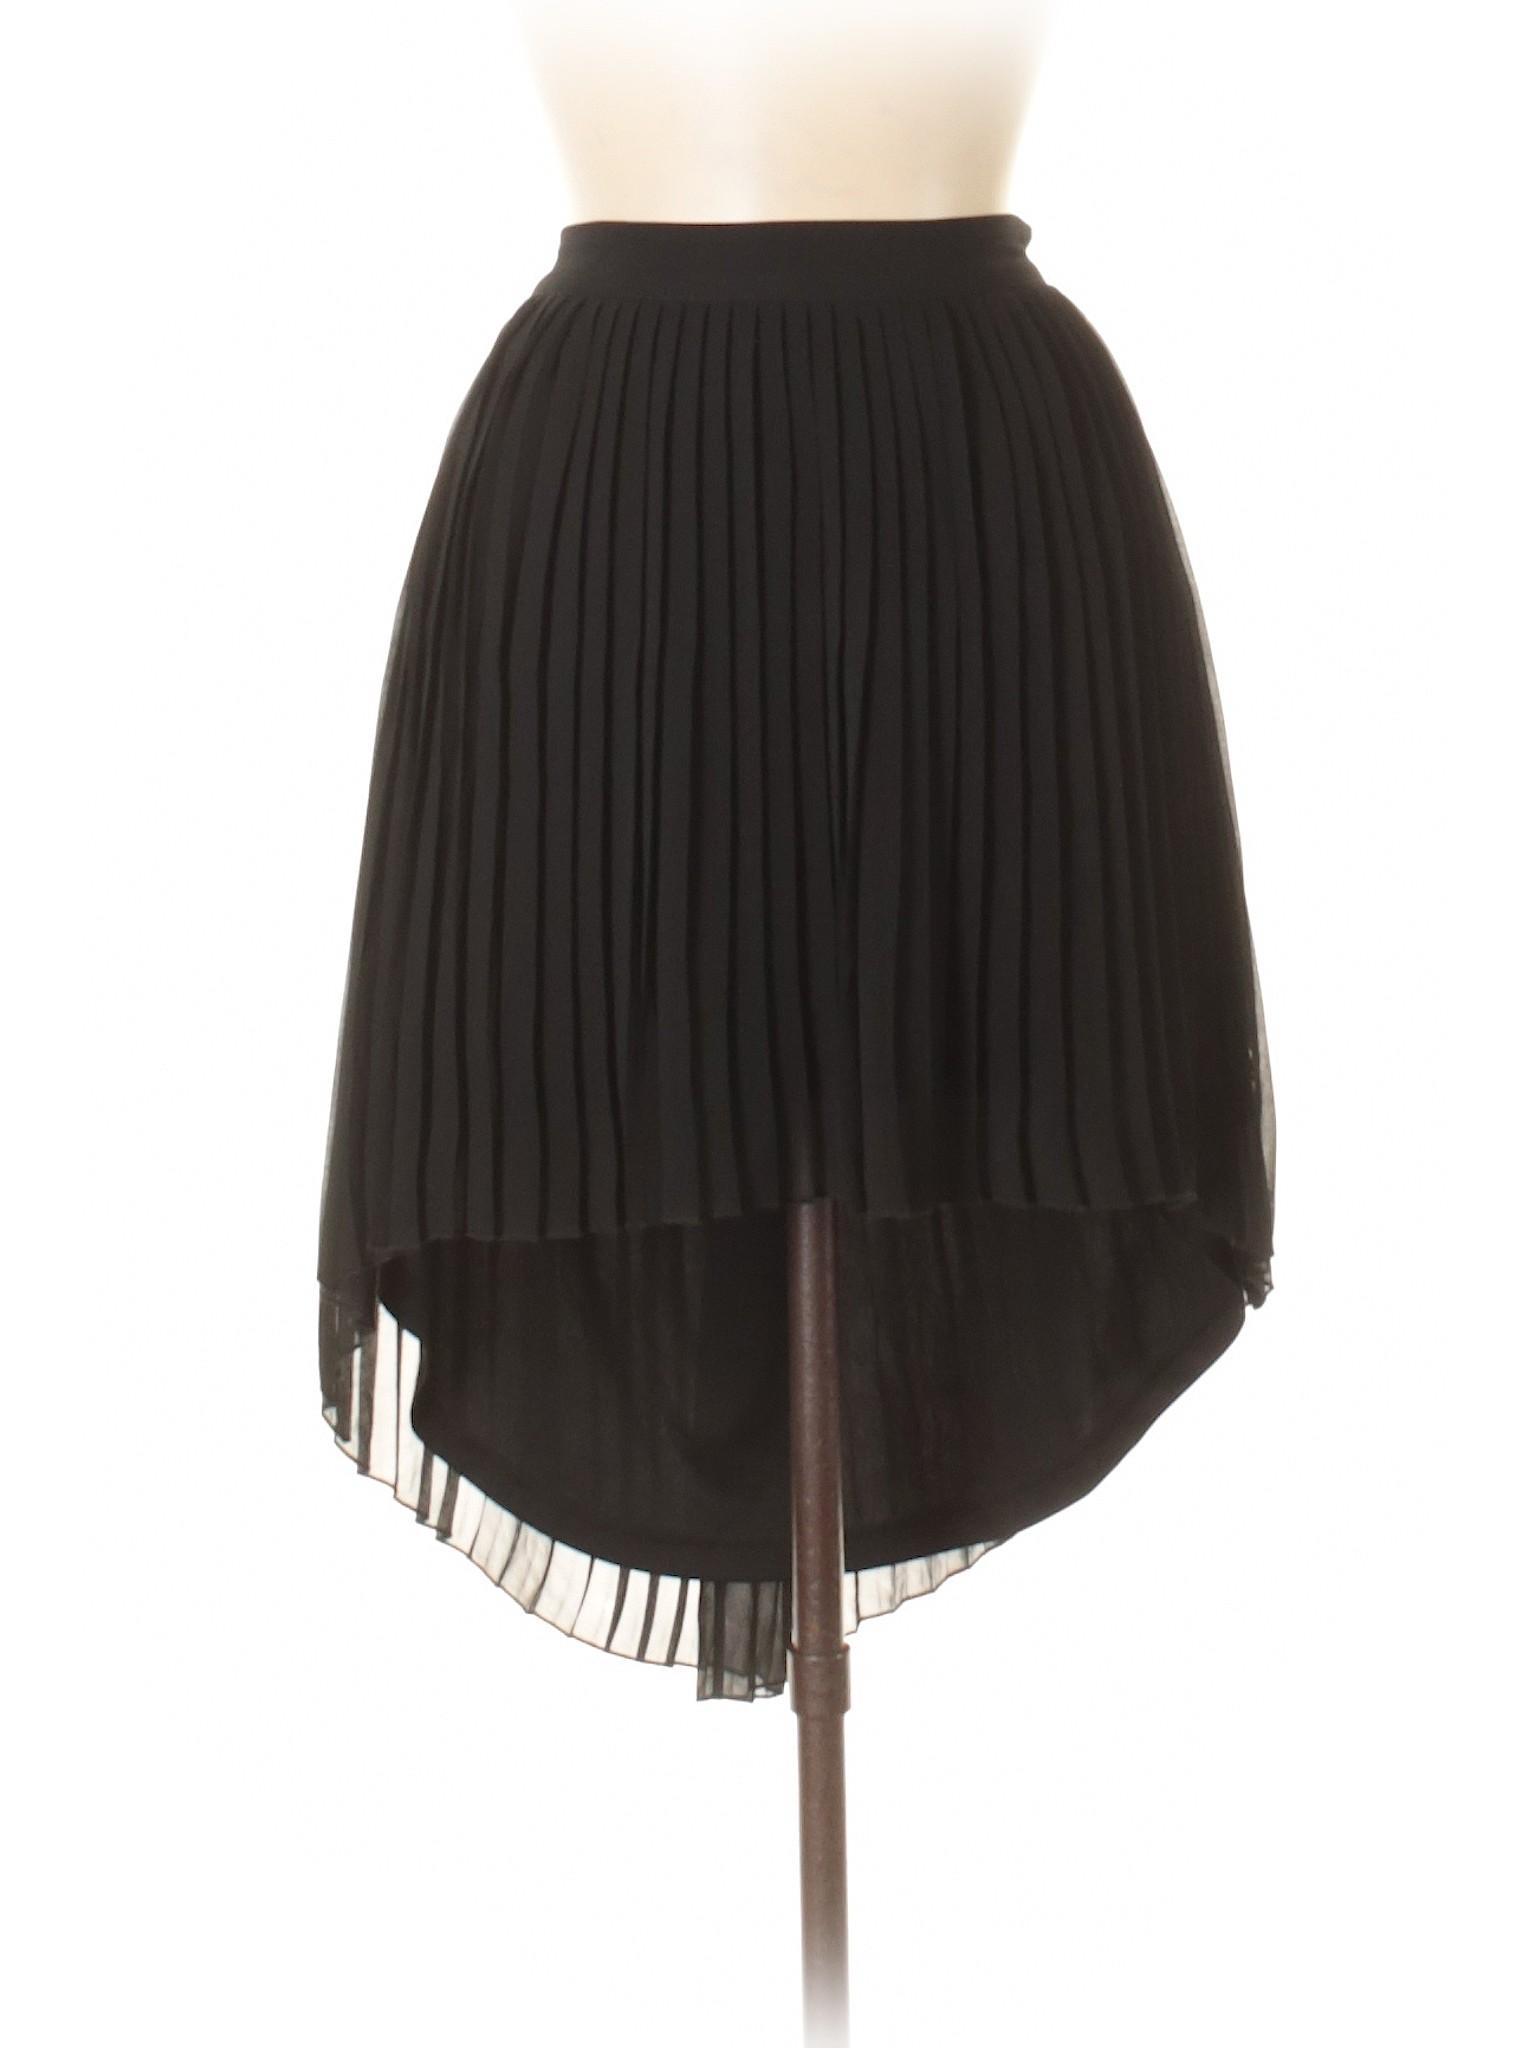 Boutique Casual Skirt Skirt Casual Boutique Skirt Casual Boutique Boutique Boutique Casual Skirt Ewgqr6E